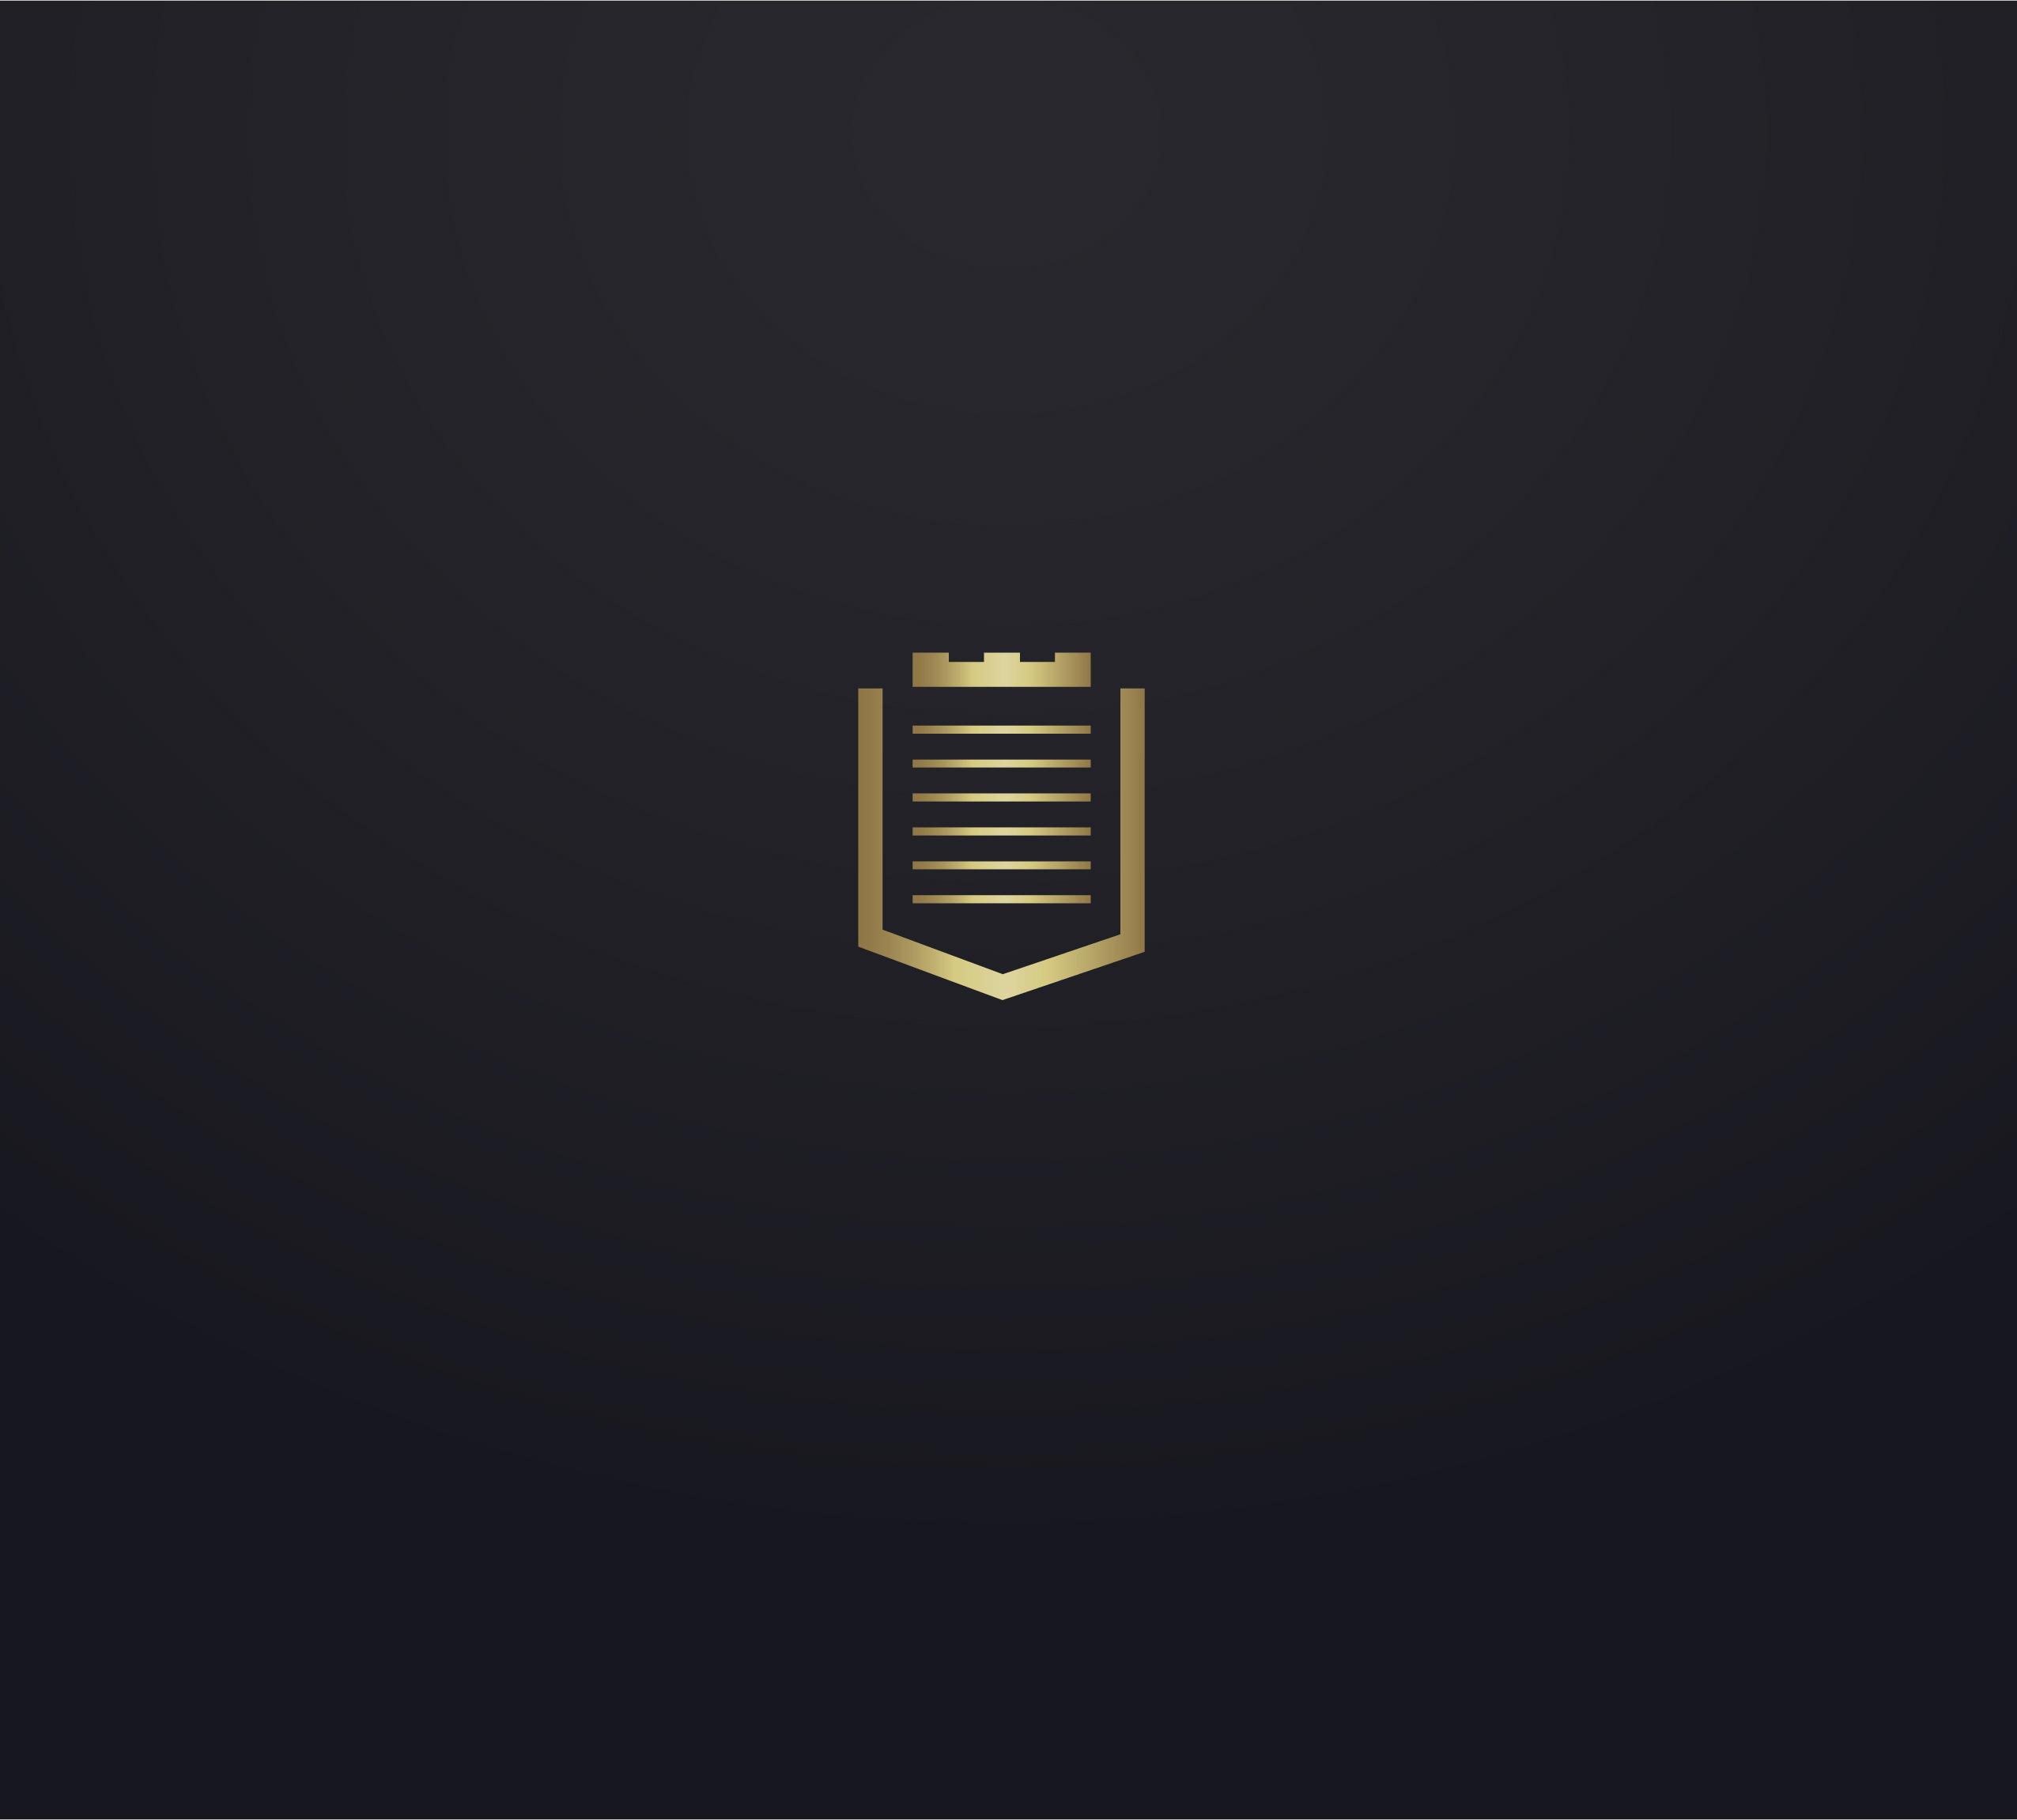 Разработка логотипа Совета (Клуба) заслуженных юристов Российской Федерации фото f_7905e3fdbcb5ac8f.jpg